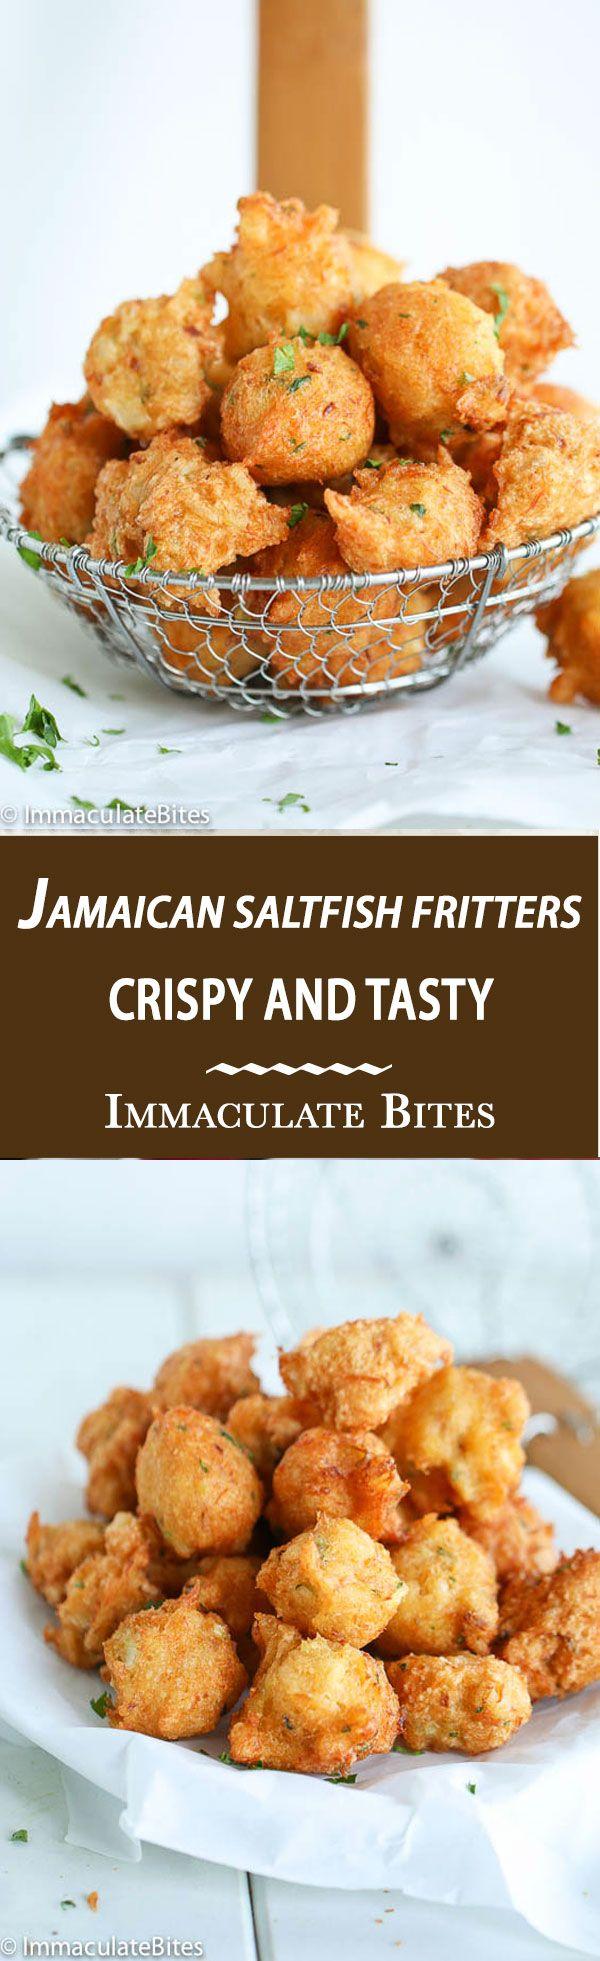 Salt fish fritters recipe salts planes and caribbean for Caribbean fish recipes